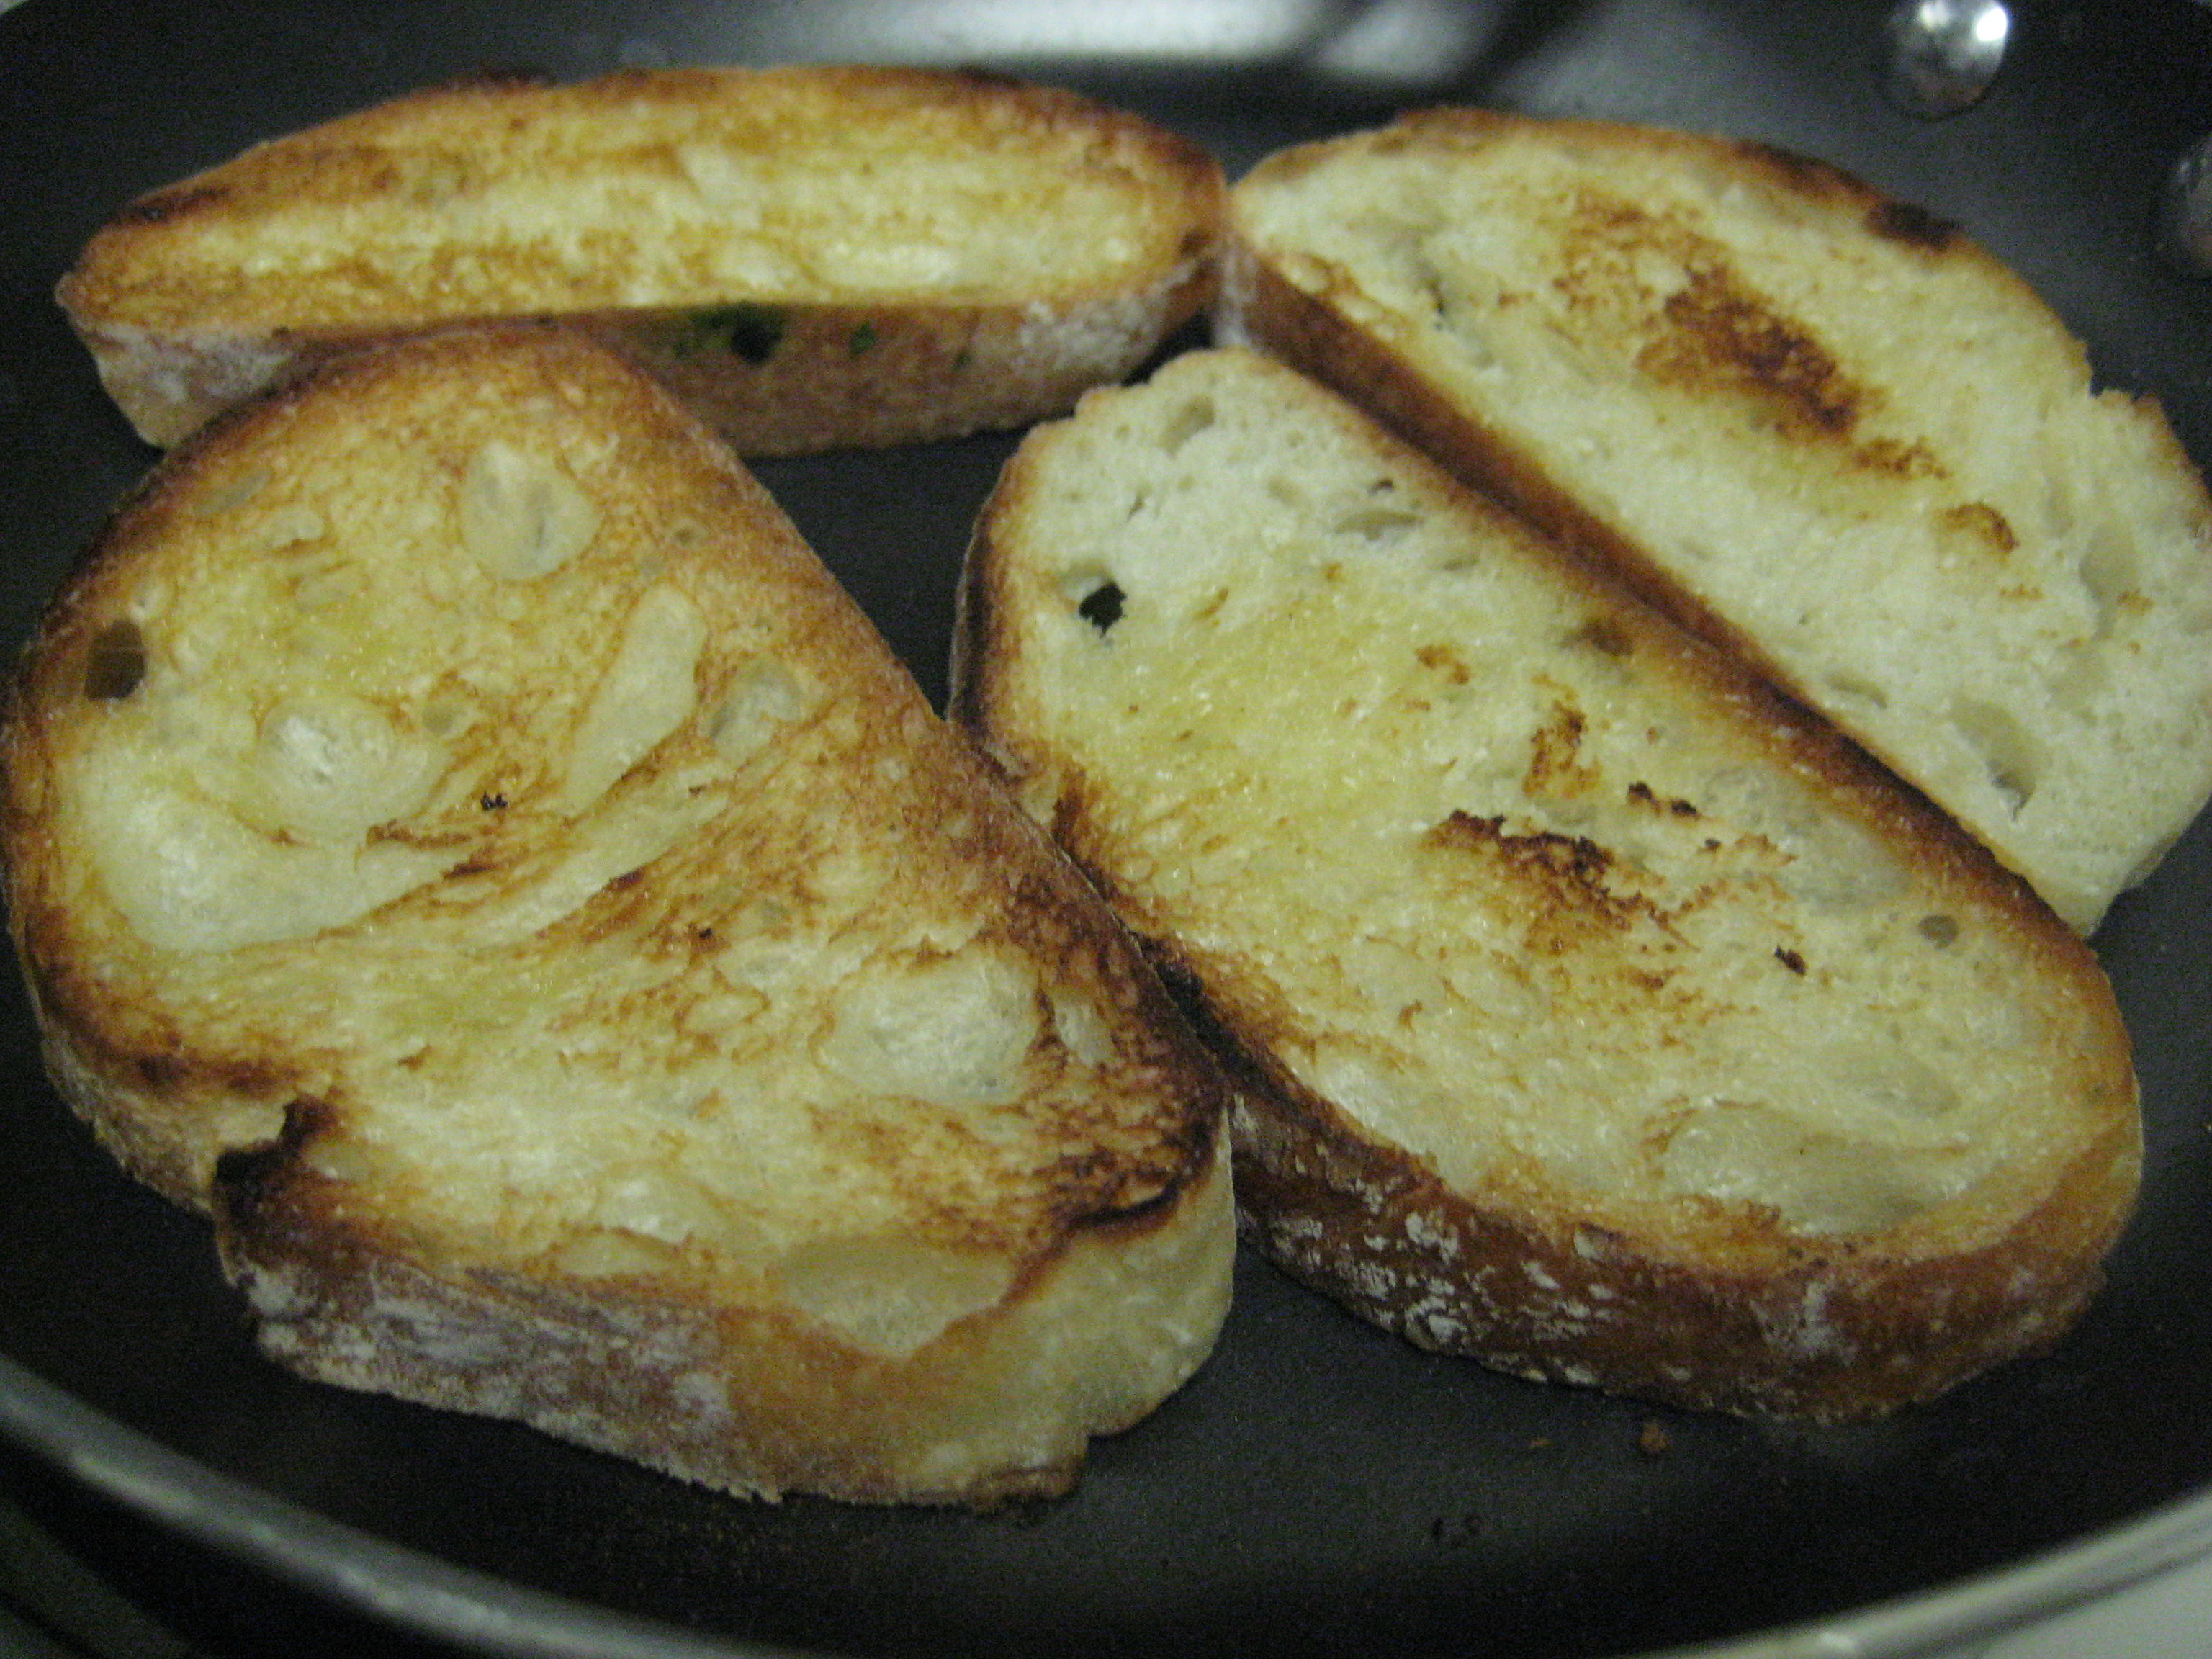 Crisp bread.